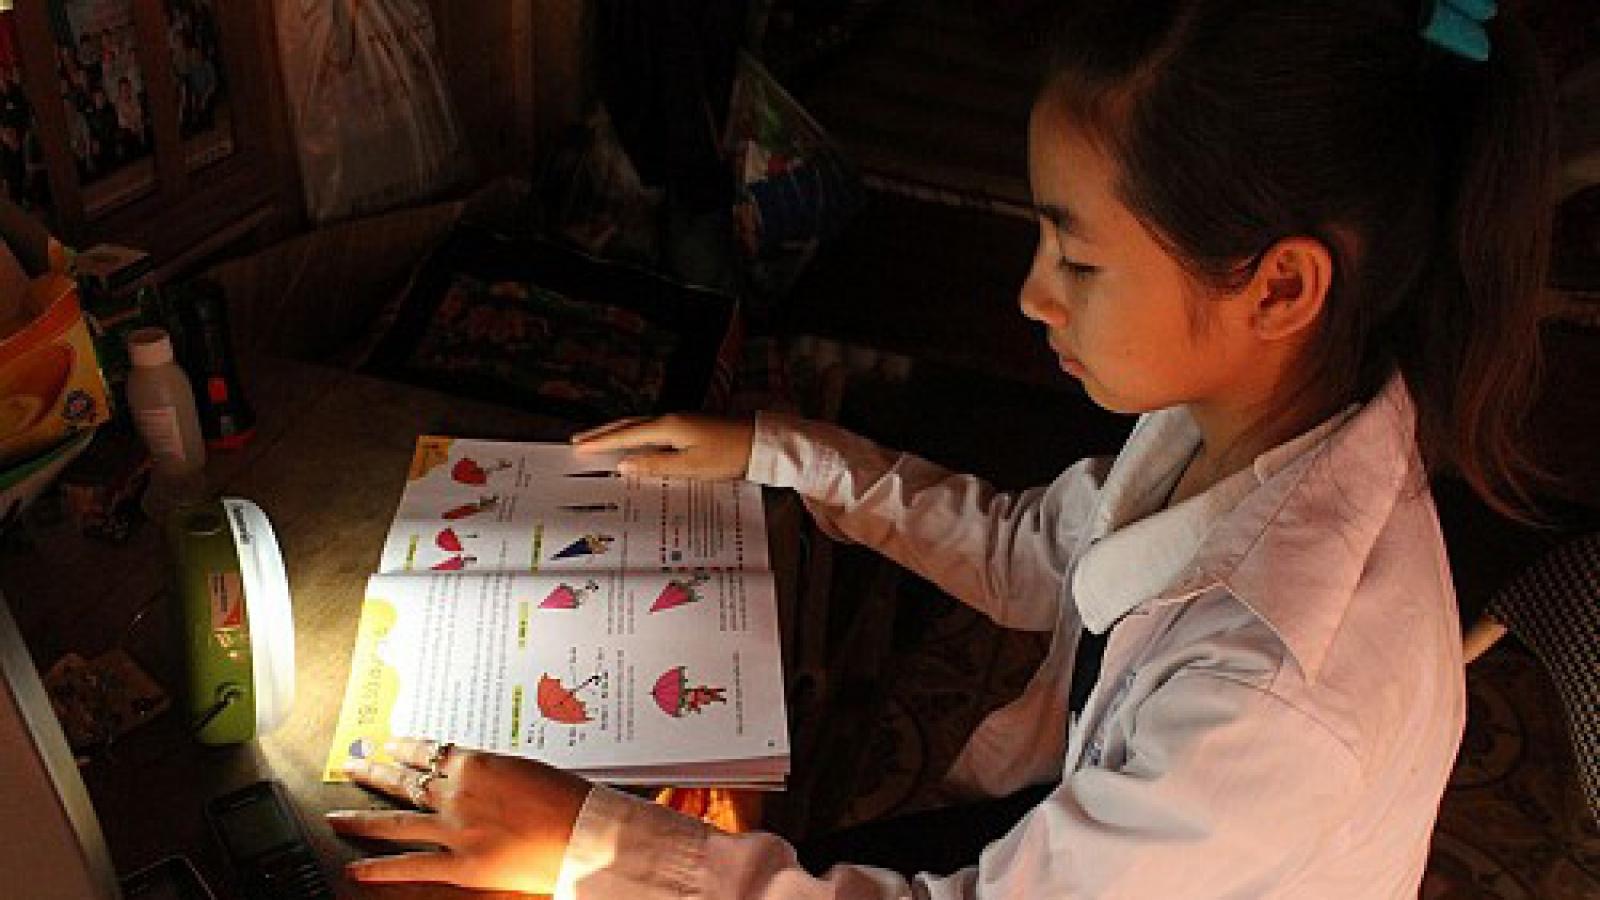 Panasonic lanterns give Vietnam's poor children access to solar power